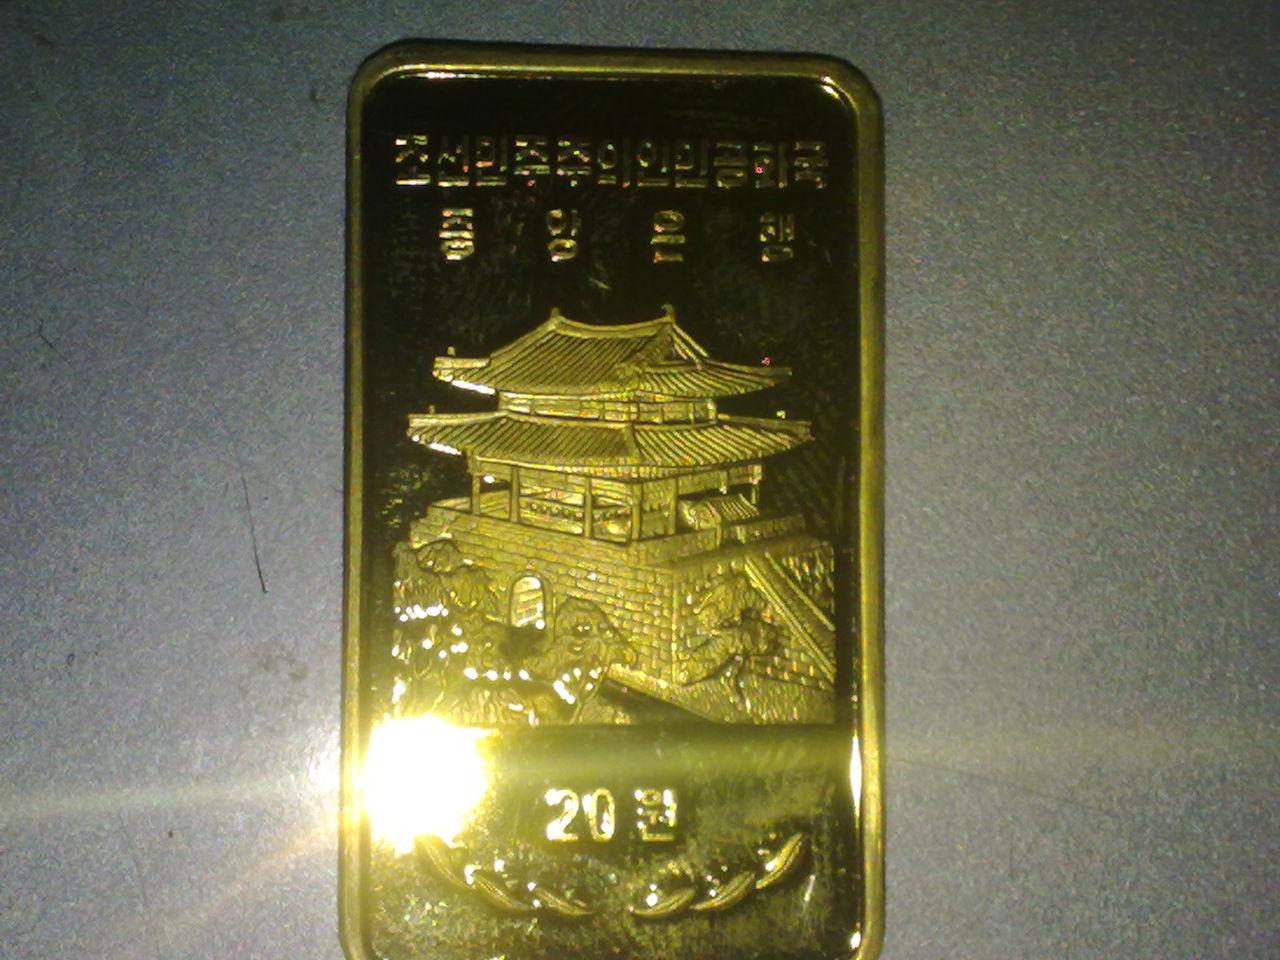 Monedas de Corea dedicadas a Emi... 007